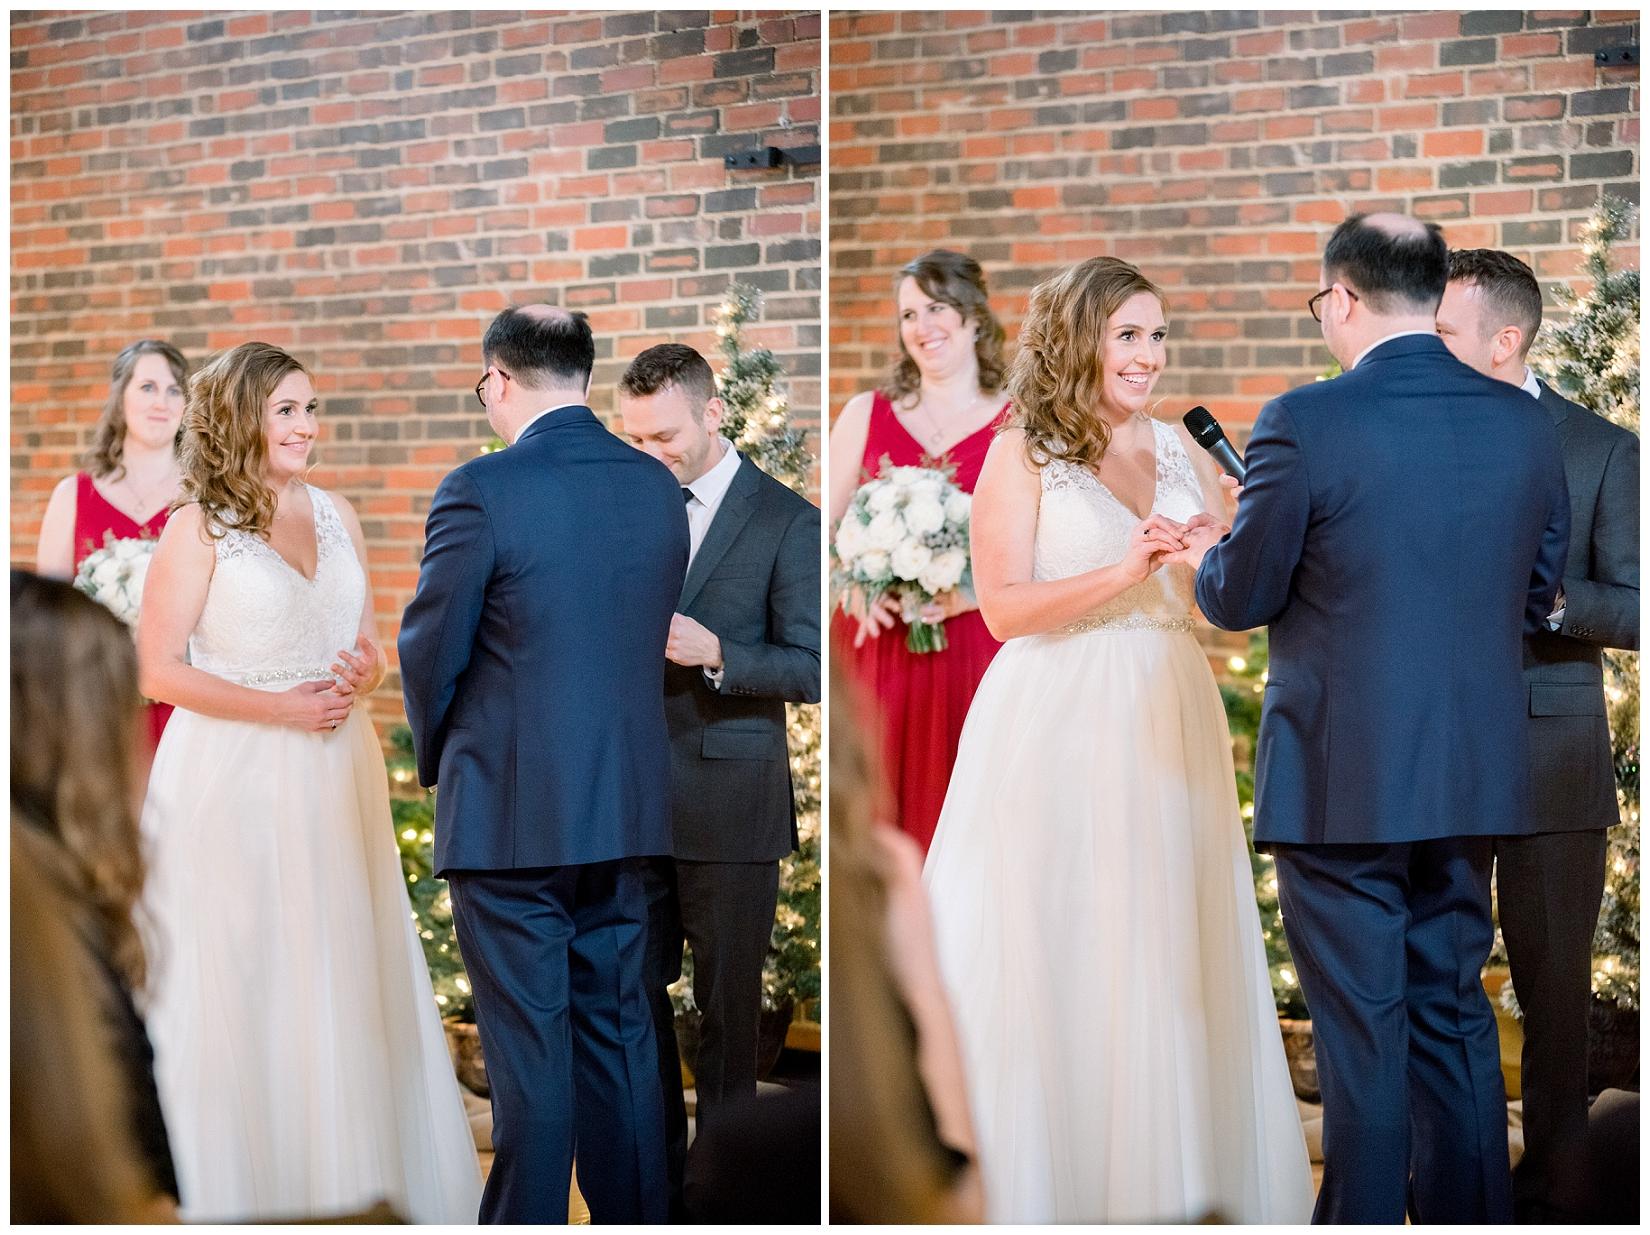 cat-alkire-wedding-photographer-indiana-chicago-indianapolis-fort-wayne_0948.jpg